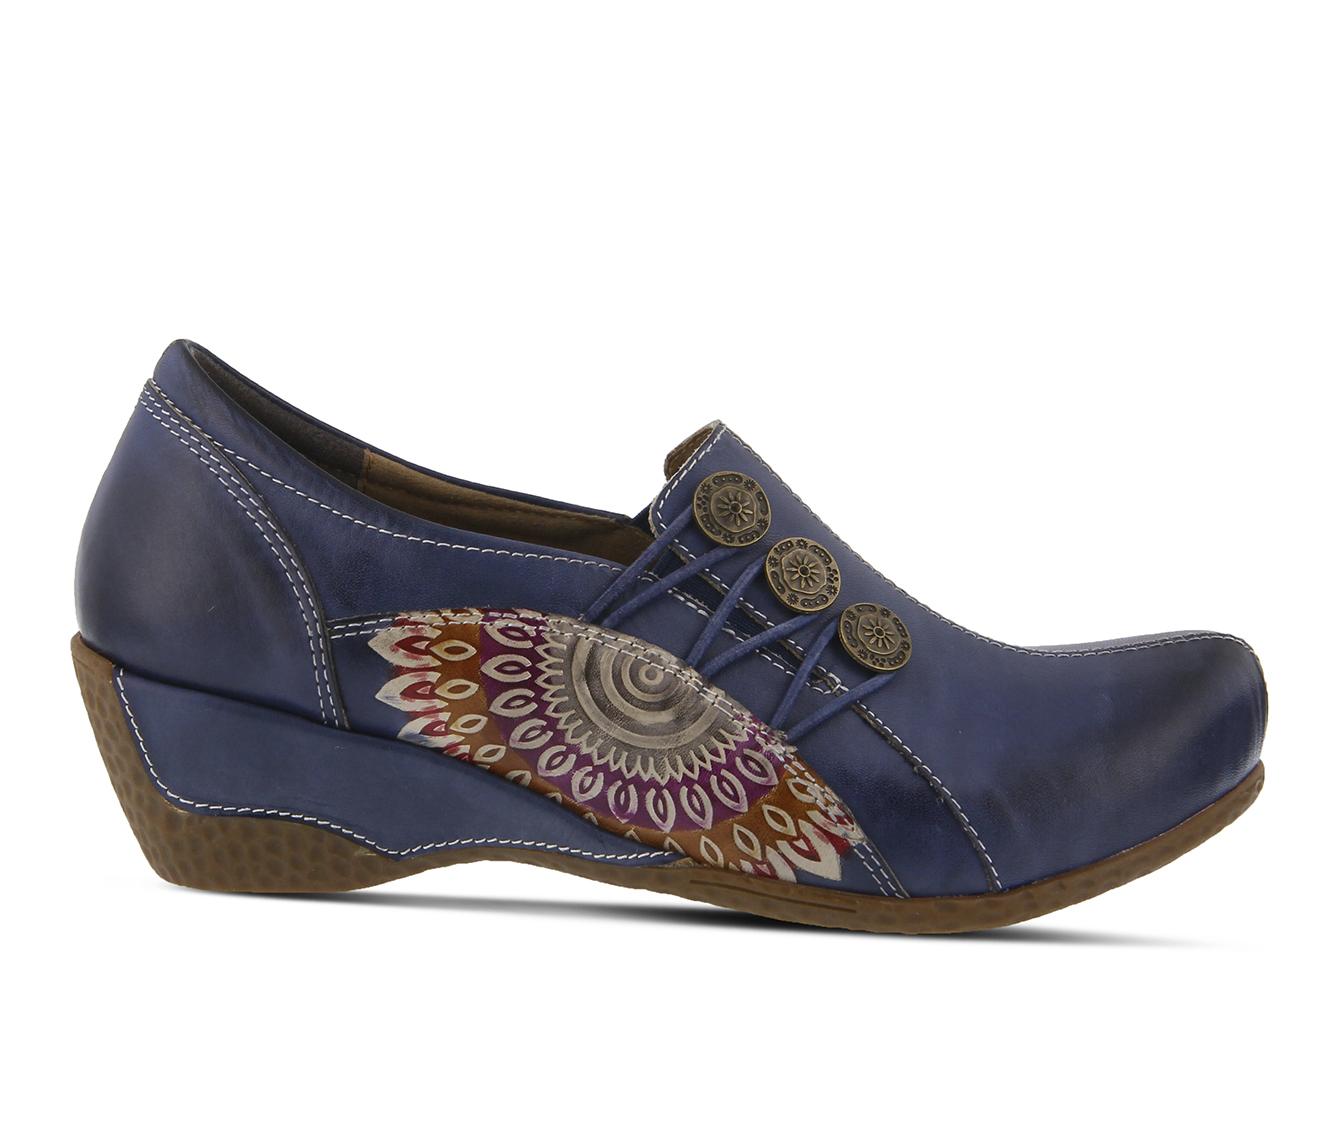 L'Artiste Agacia Women's Shoe (Blue Leather)